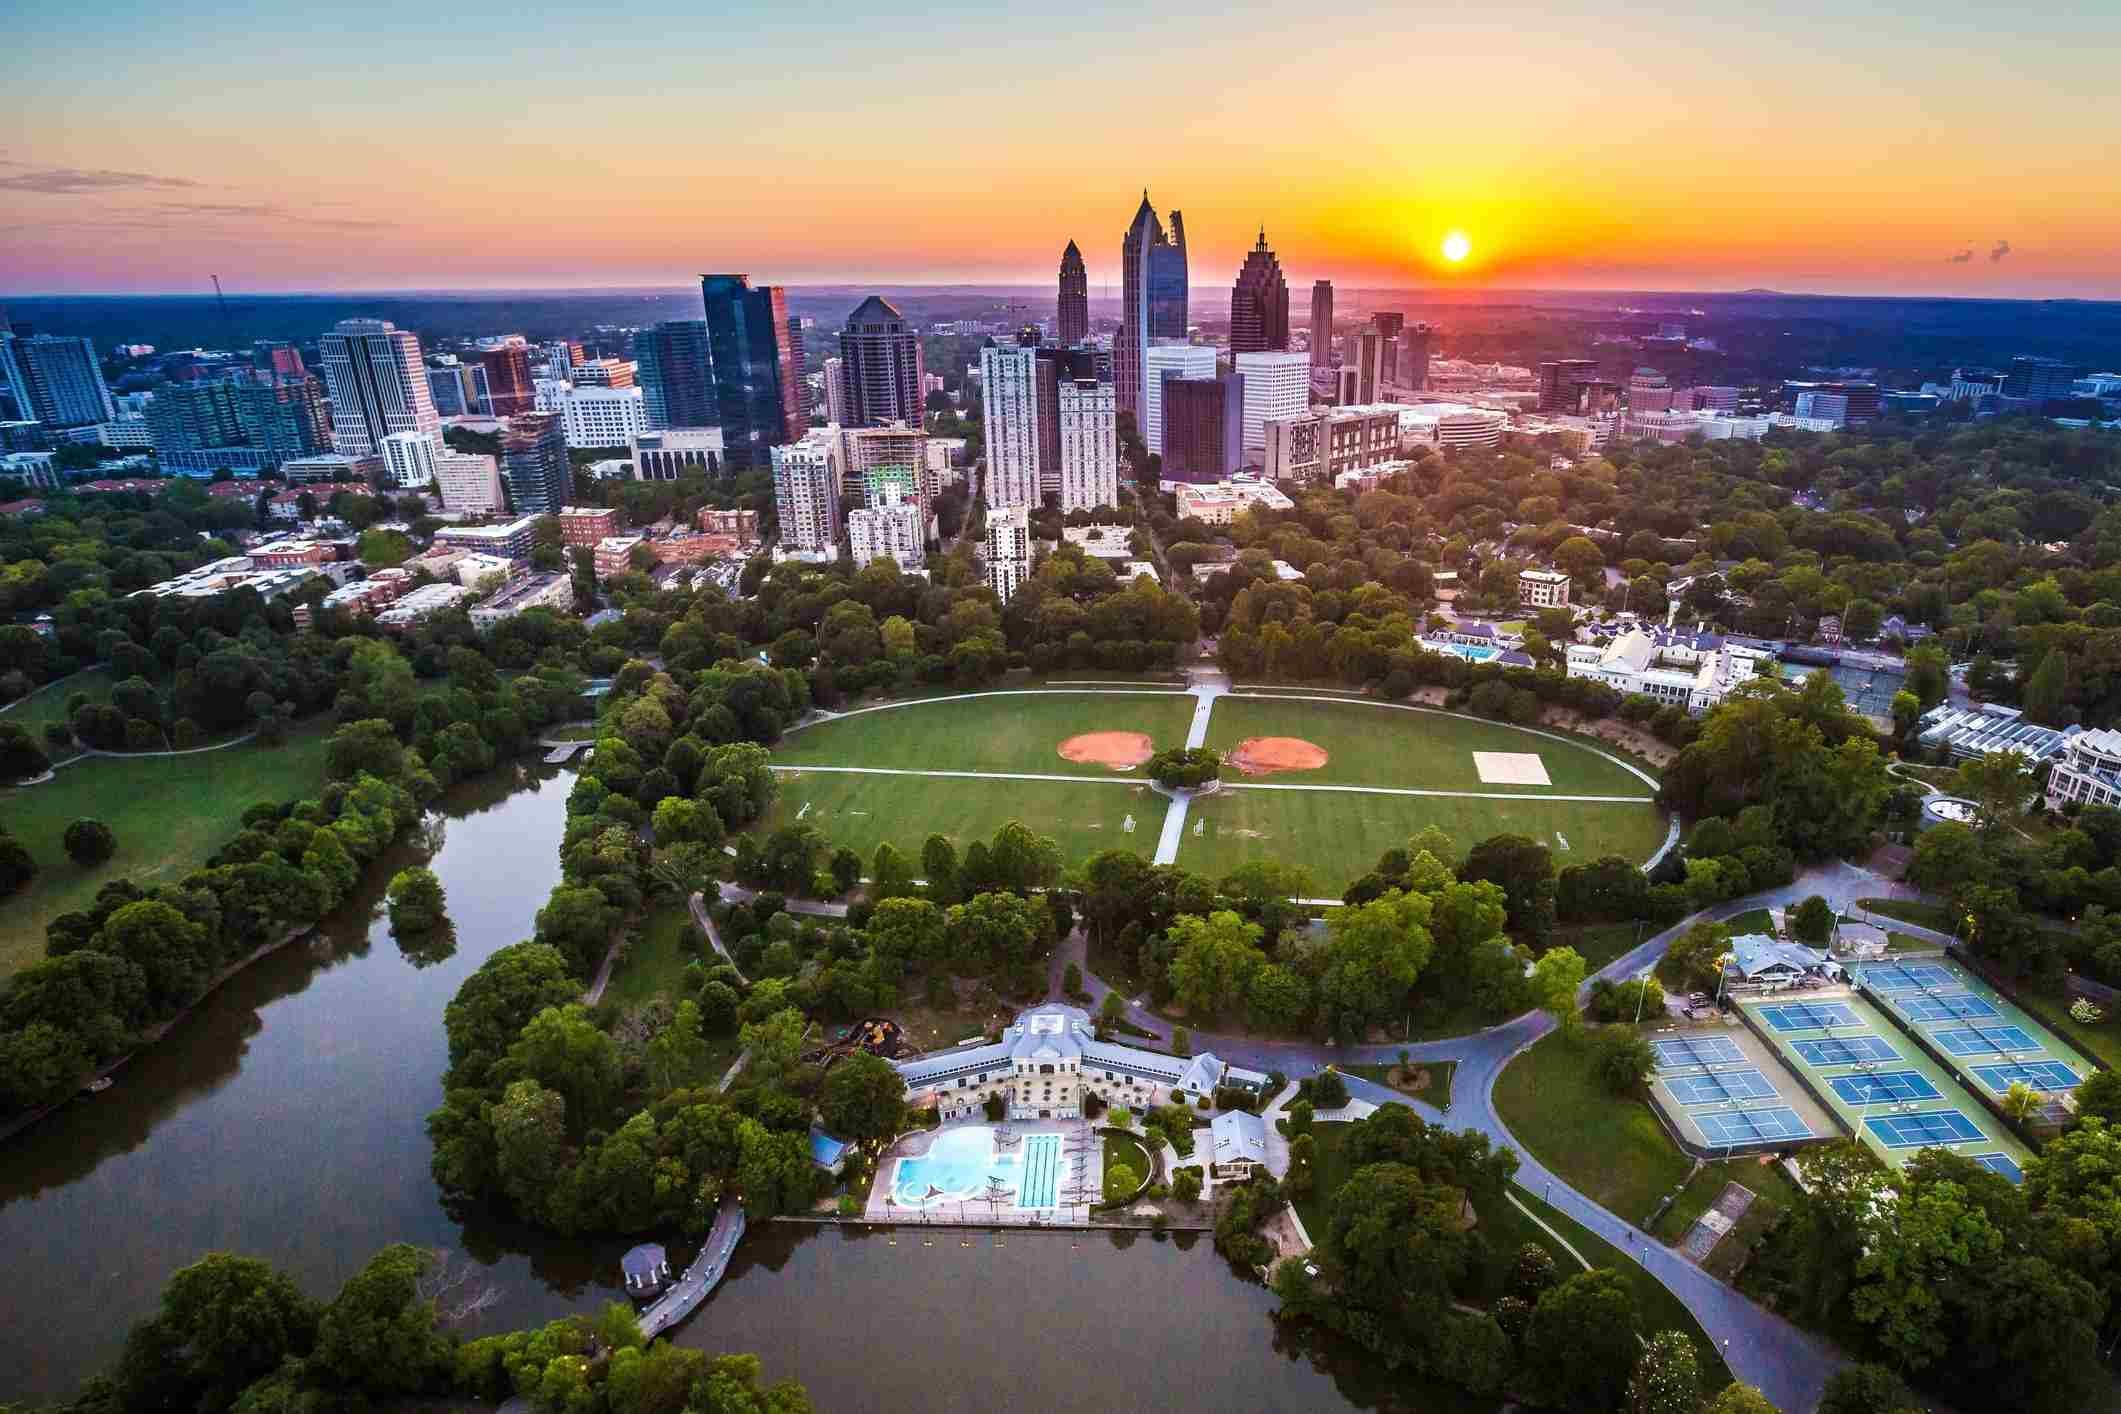 Aerial view of Piedmont Park, Atlanta